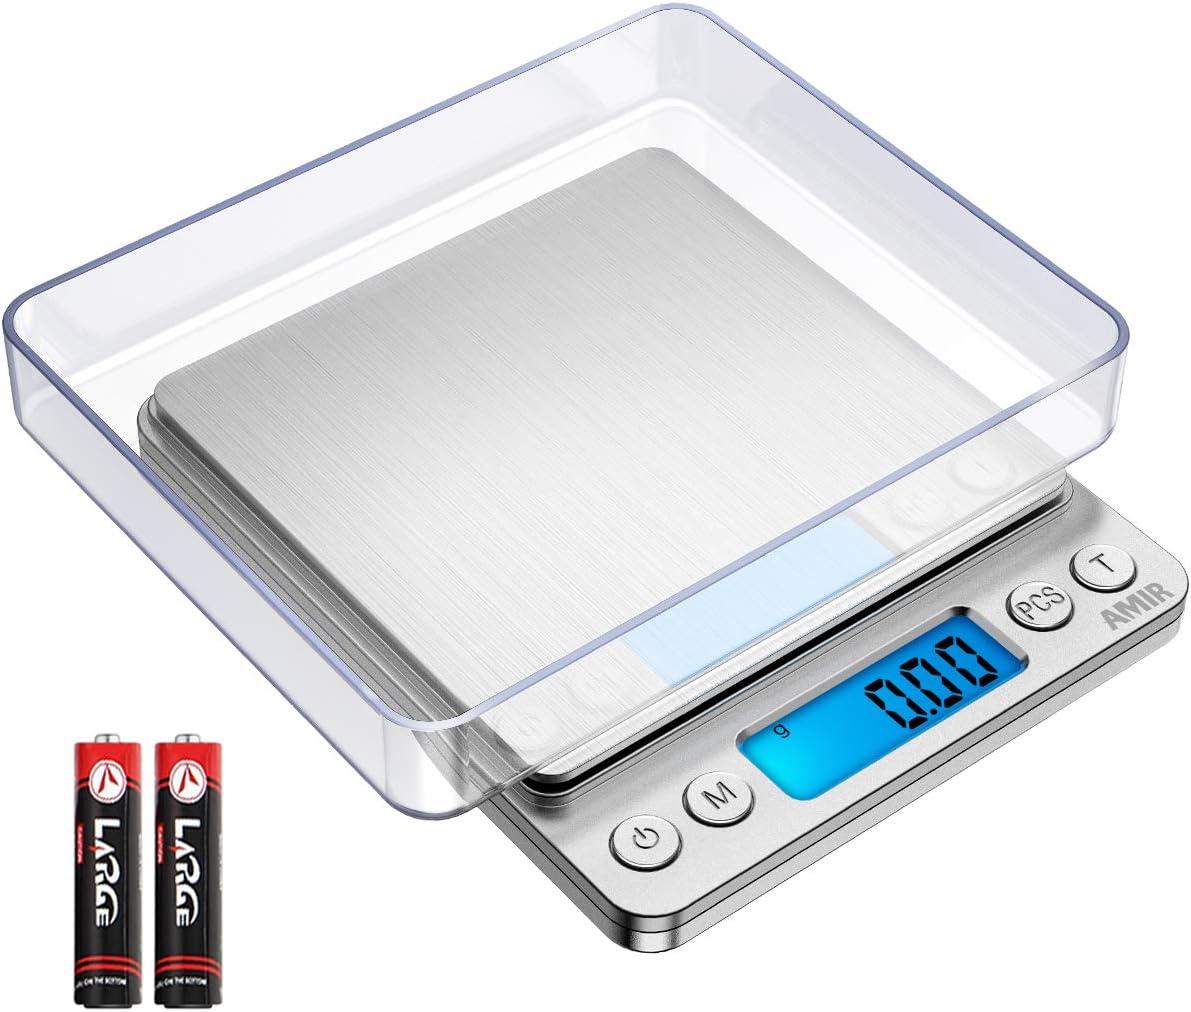 6. AMIR Digital Mini Pocket Jewelry Scale